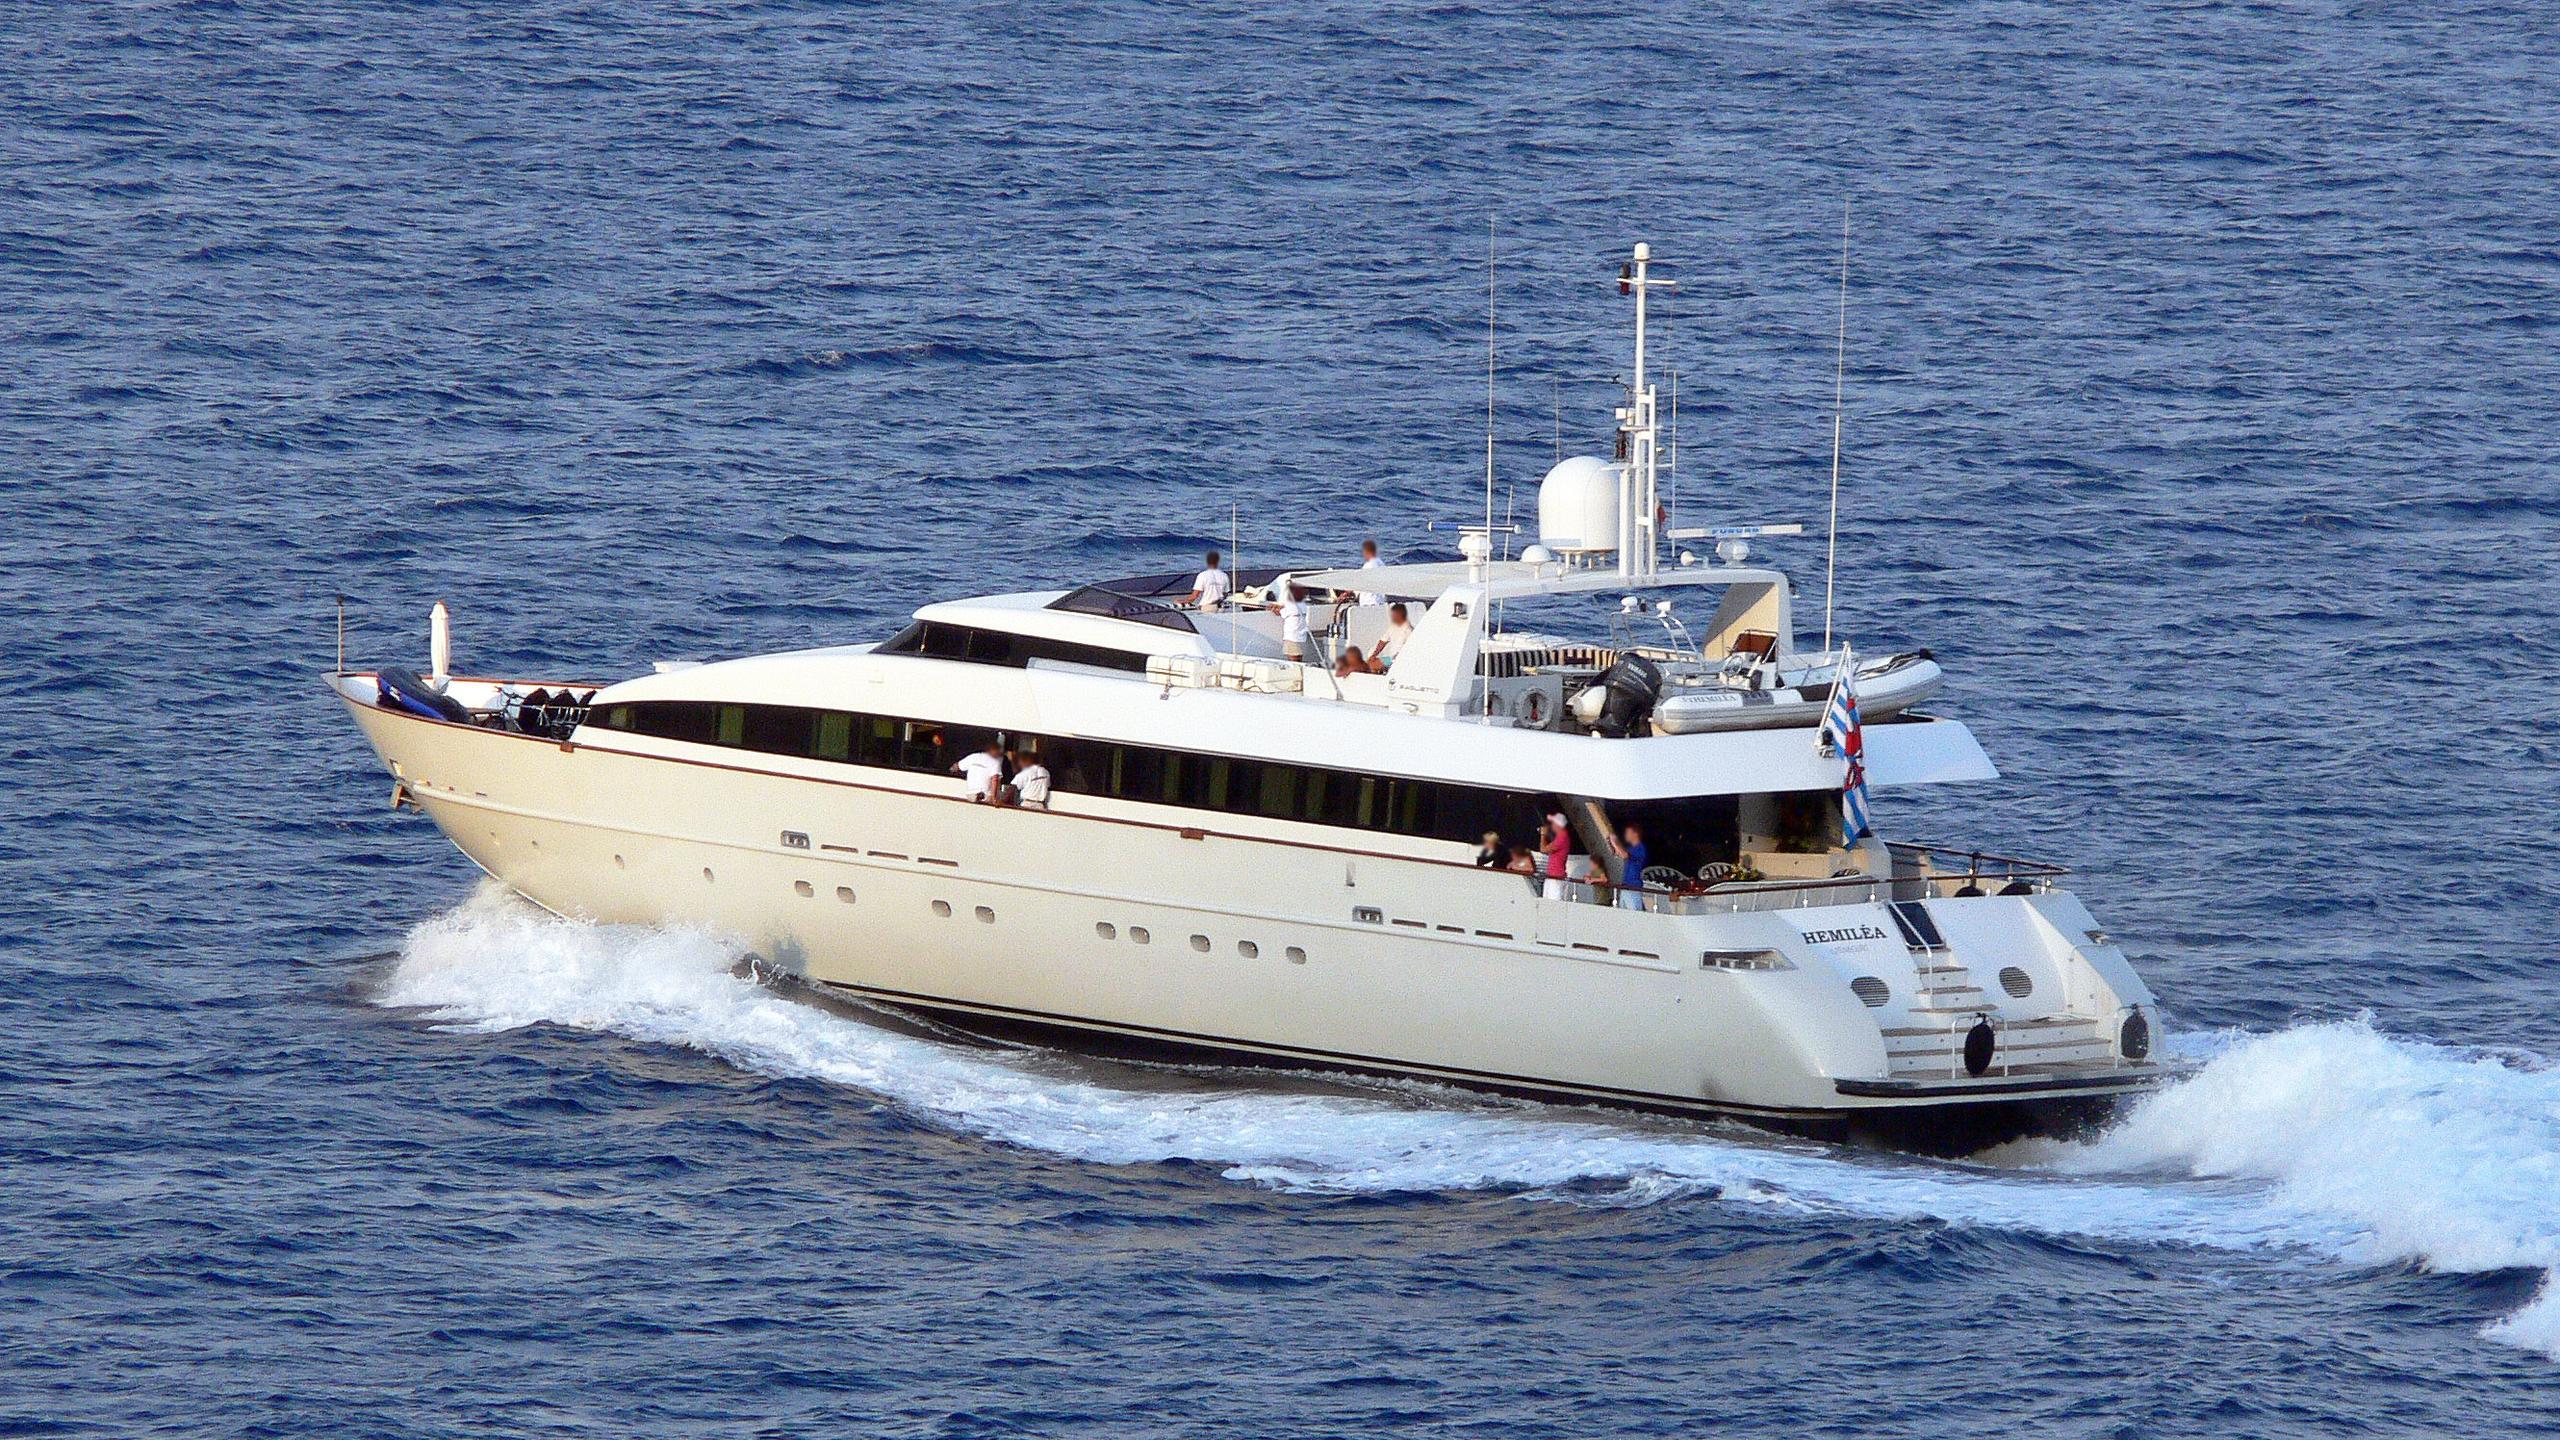 hemilea-motor-yacht-baglietto-1992-41m-cruising-stern